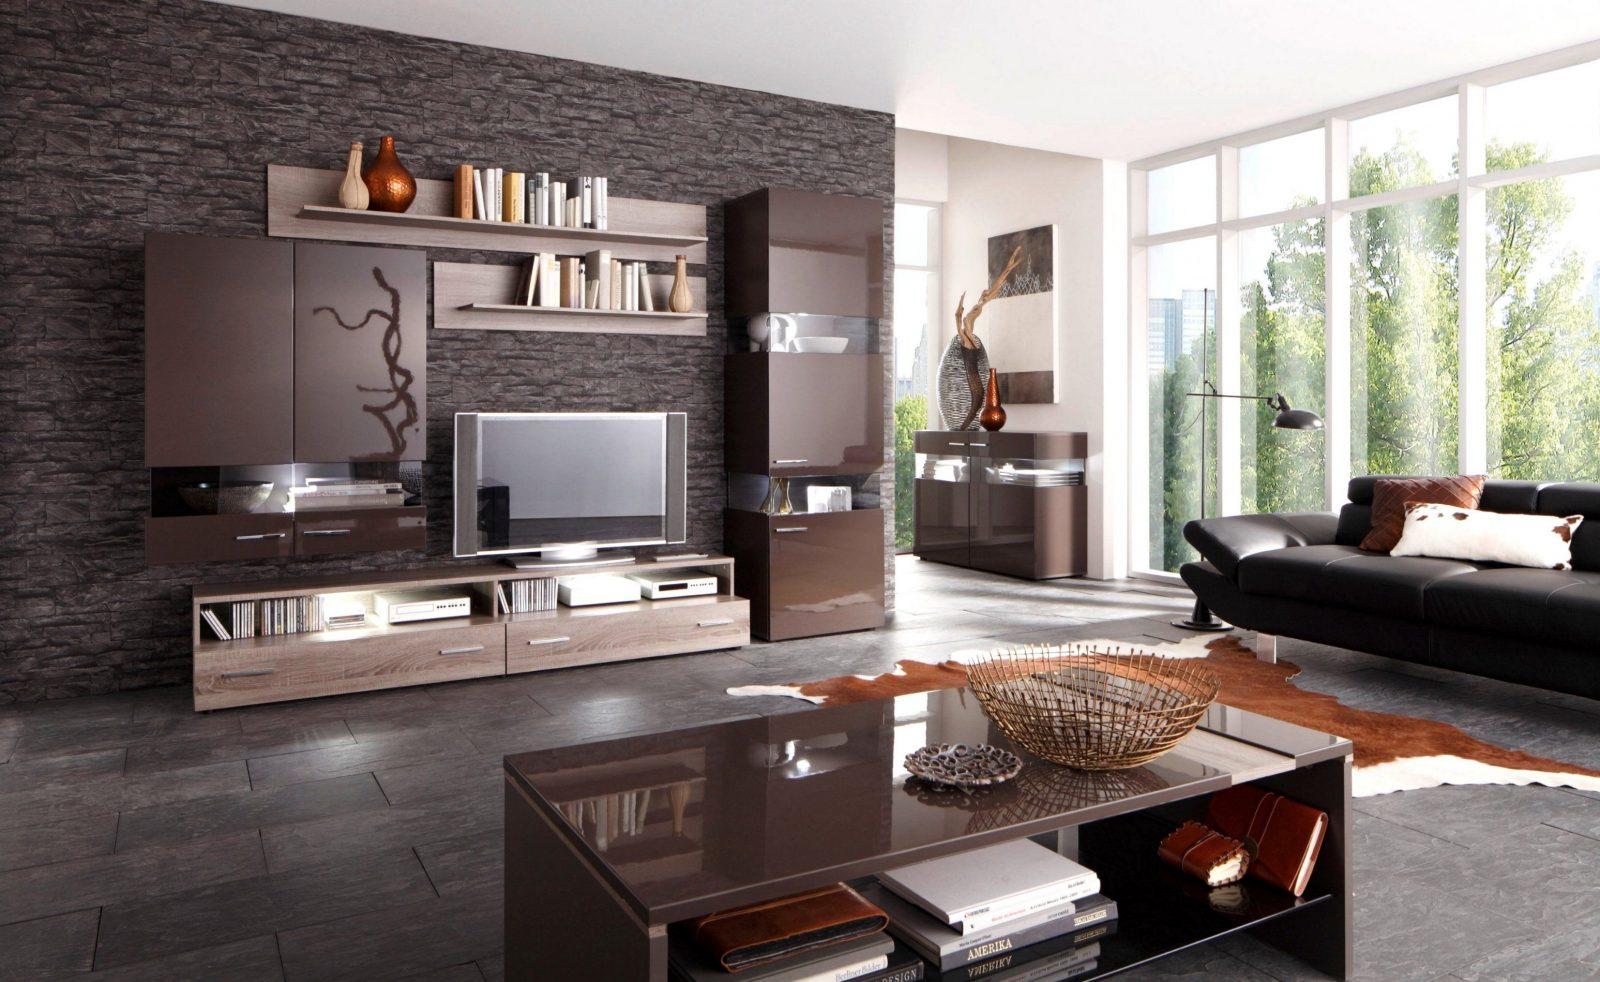 Schlafzimmer Dunkle Möbel Schwarze Mobel Mabel Design Schlafzimmer